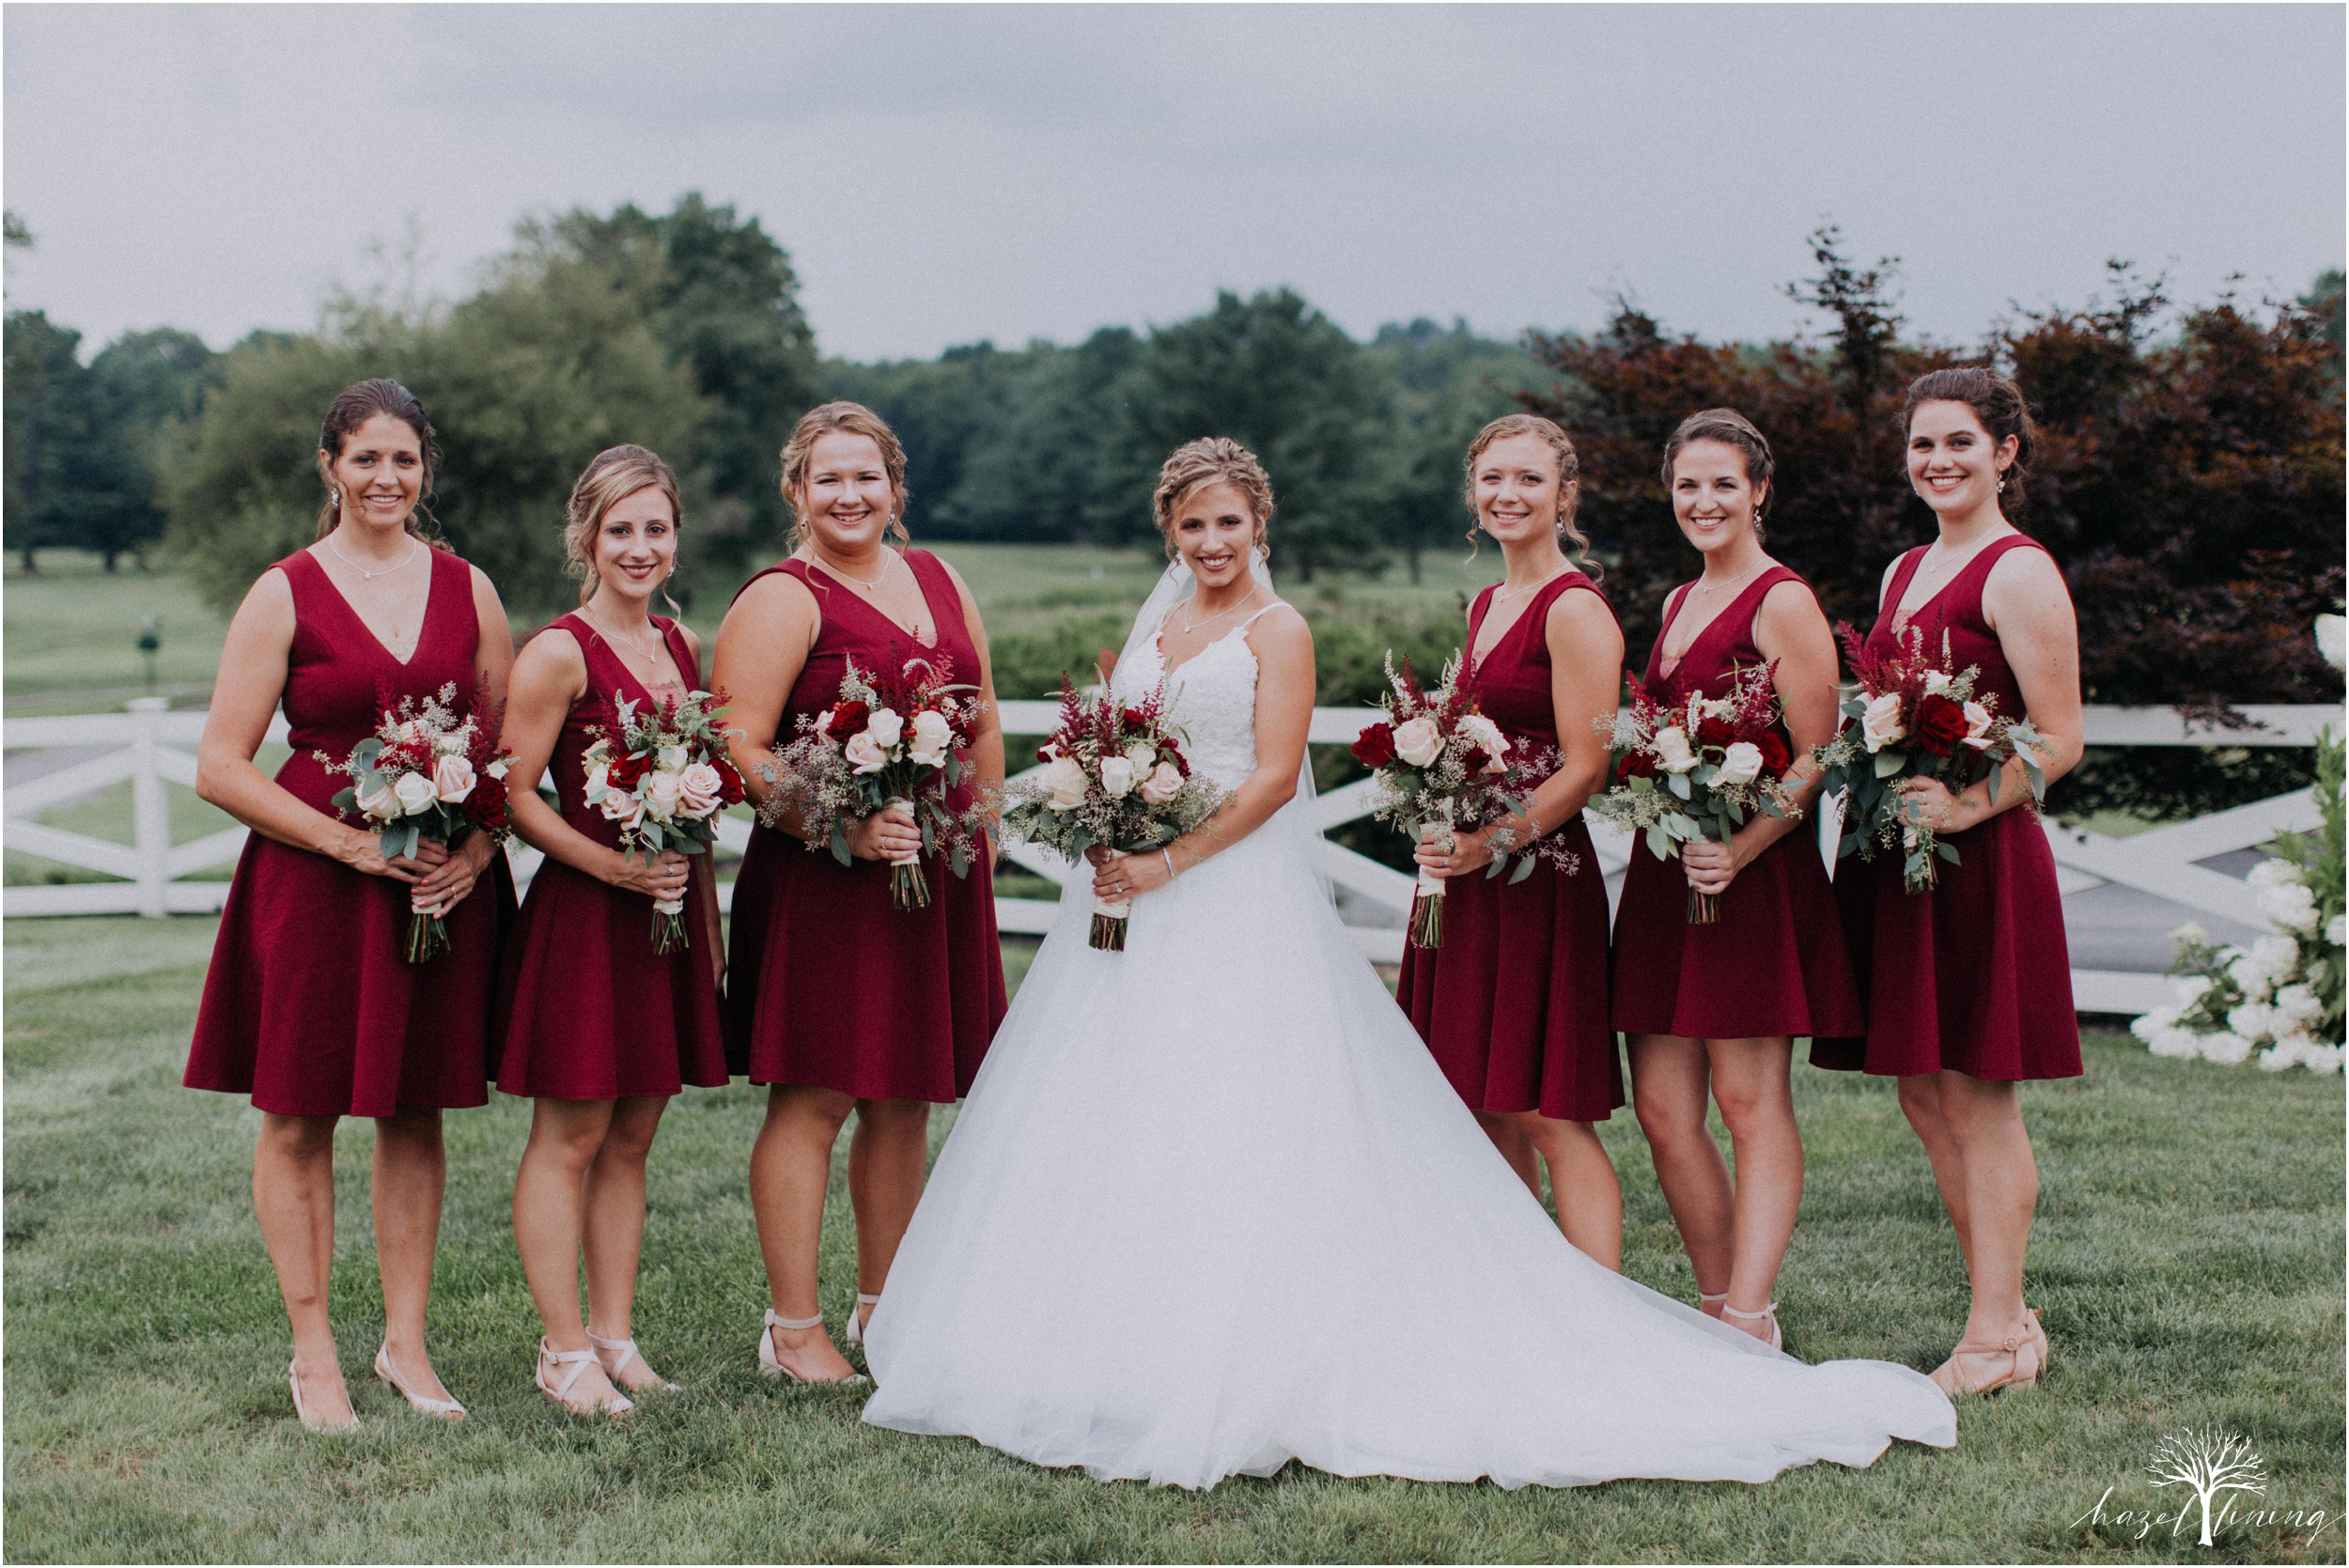 jonathan-weibel-becky-haywood-loft-at-sweetwater-cc-pennsburg-pennsylvania-rainy-day-summer-wedding-hazel-lining-travel-wedding-elopement-photography_0034.jpg